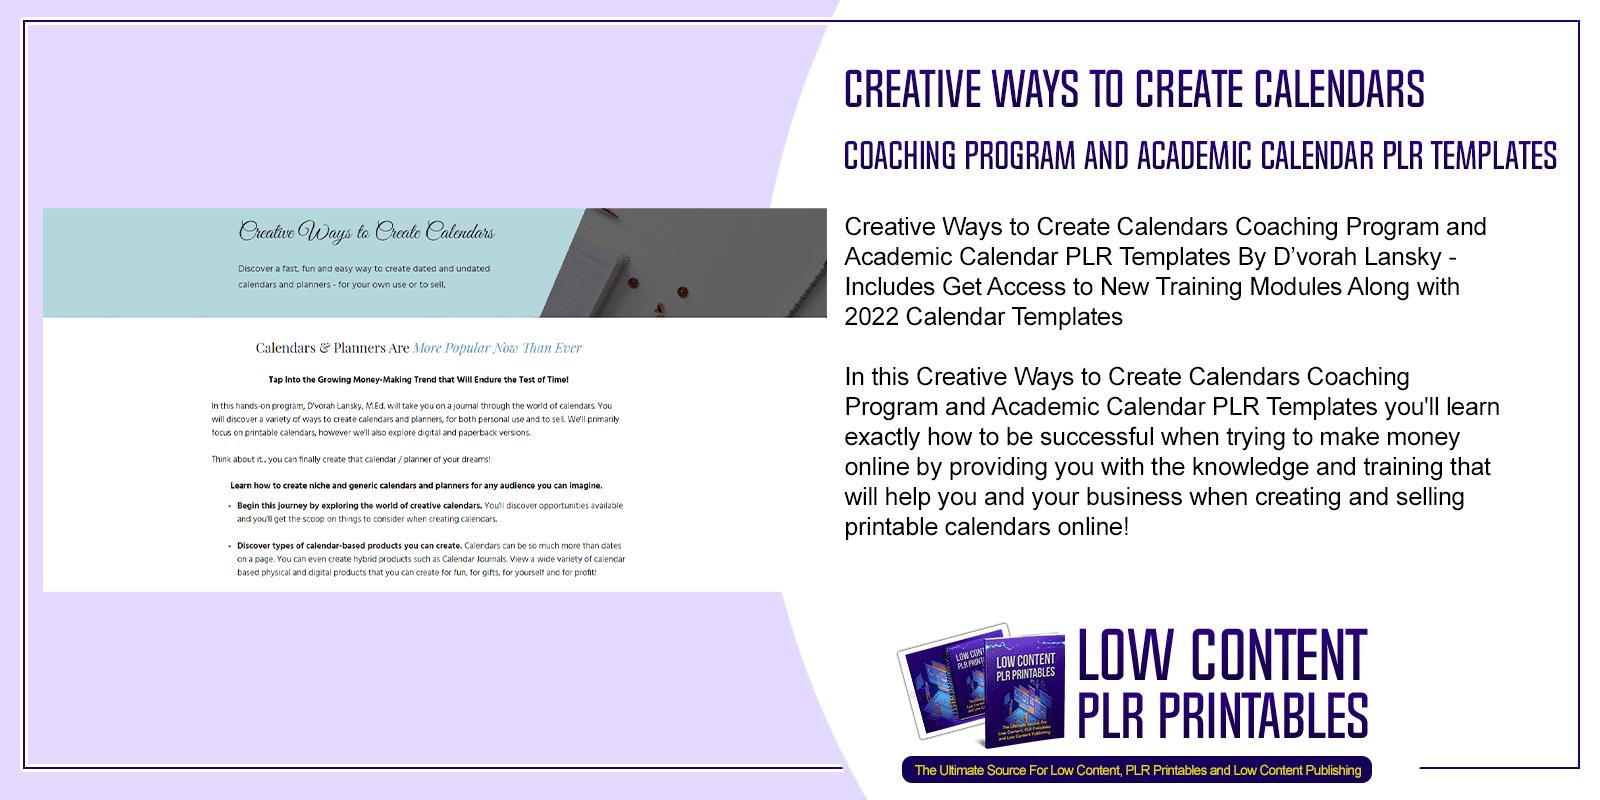 Creative Ways to Create Calendars Coaching Program and Academic Calendar PLR Templates